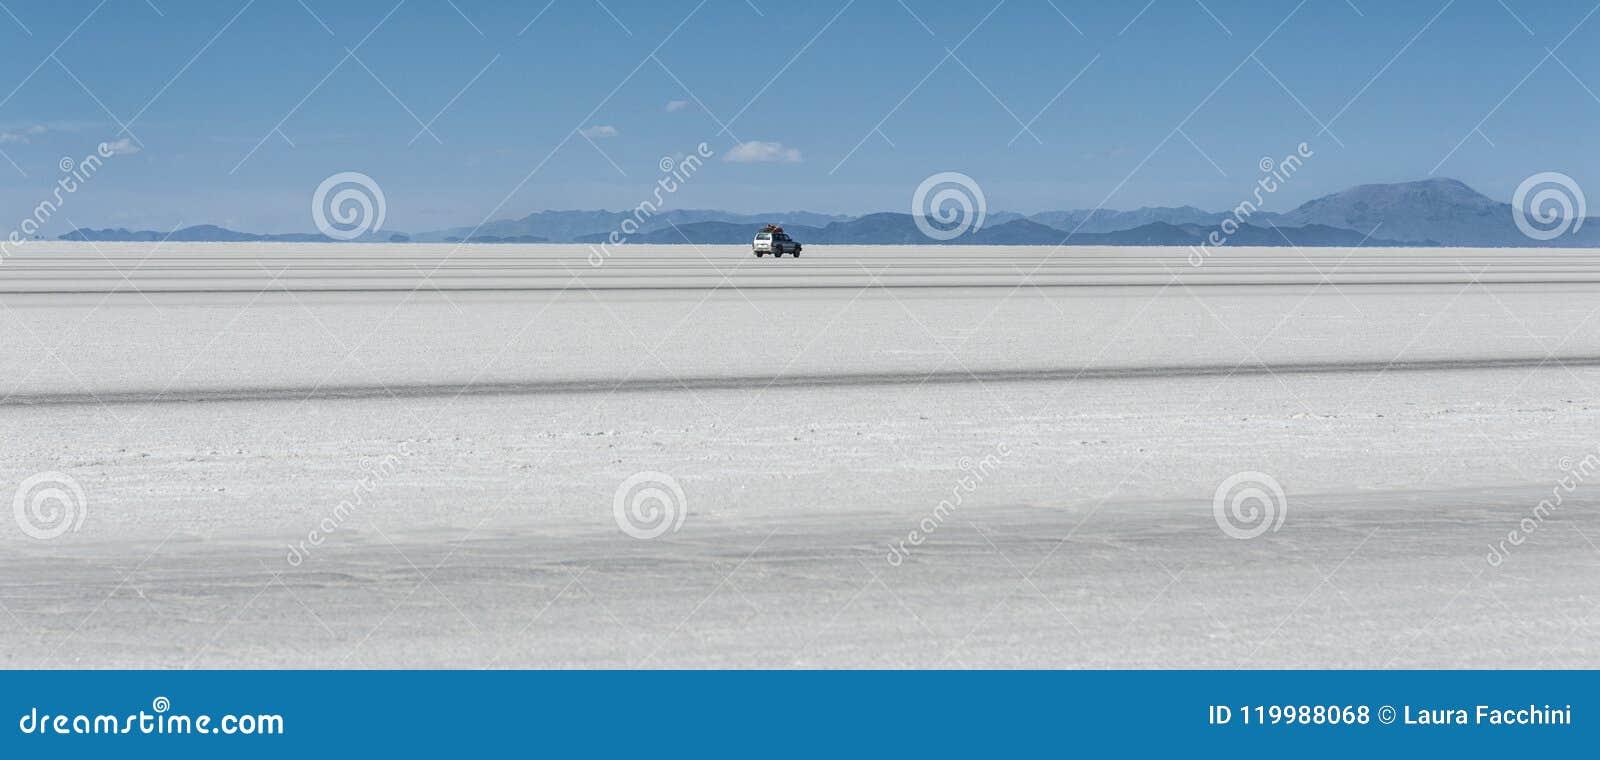 Off-road car in the Salar de Uyuni is largest salt flat in the World UNESCO World Heritage Site - Altiplano, Bolivia